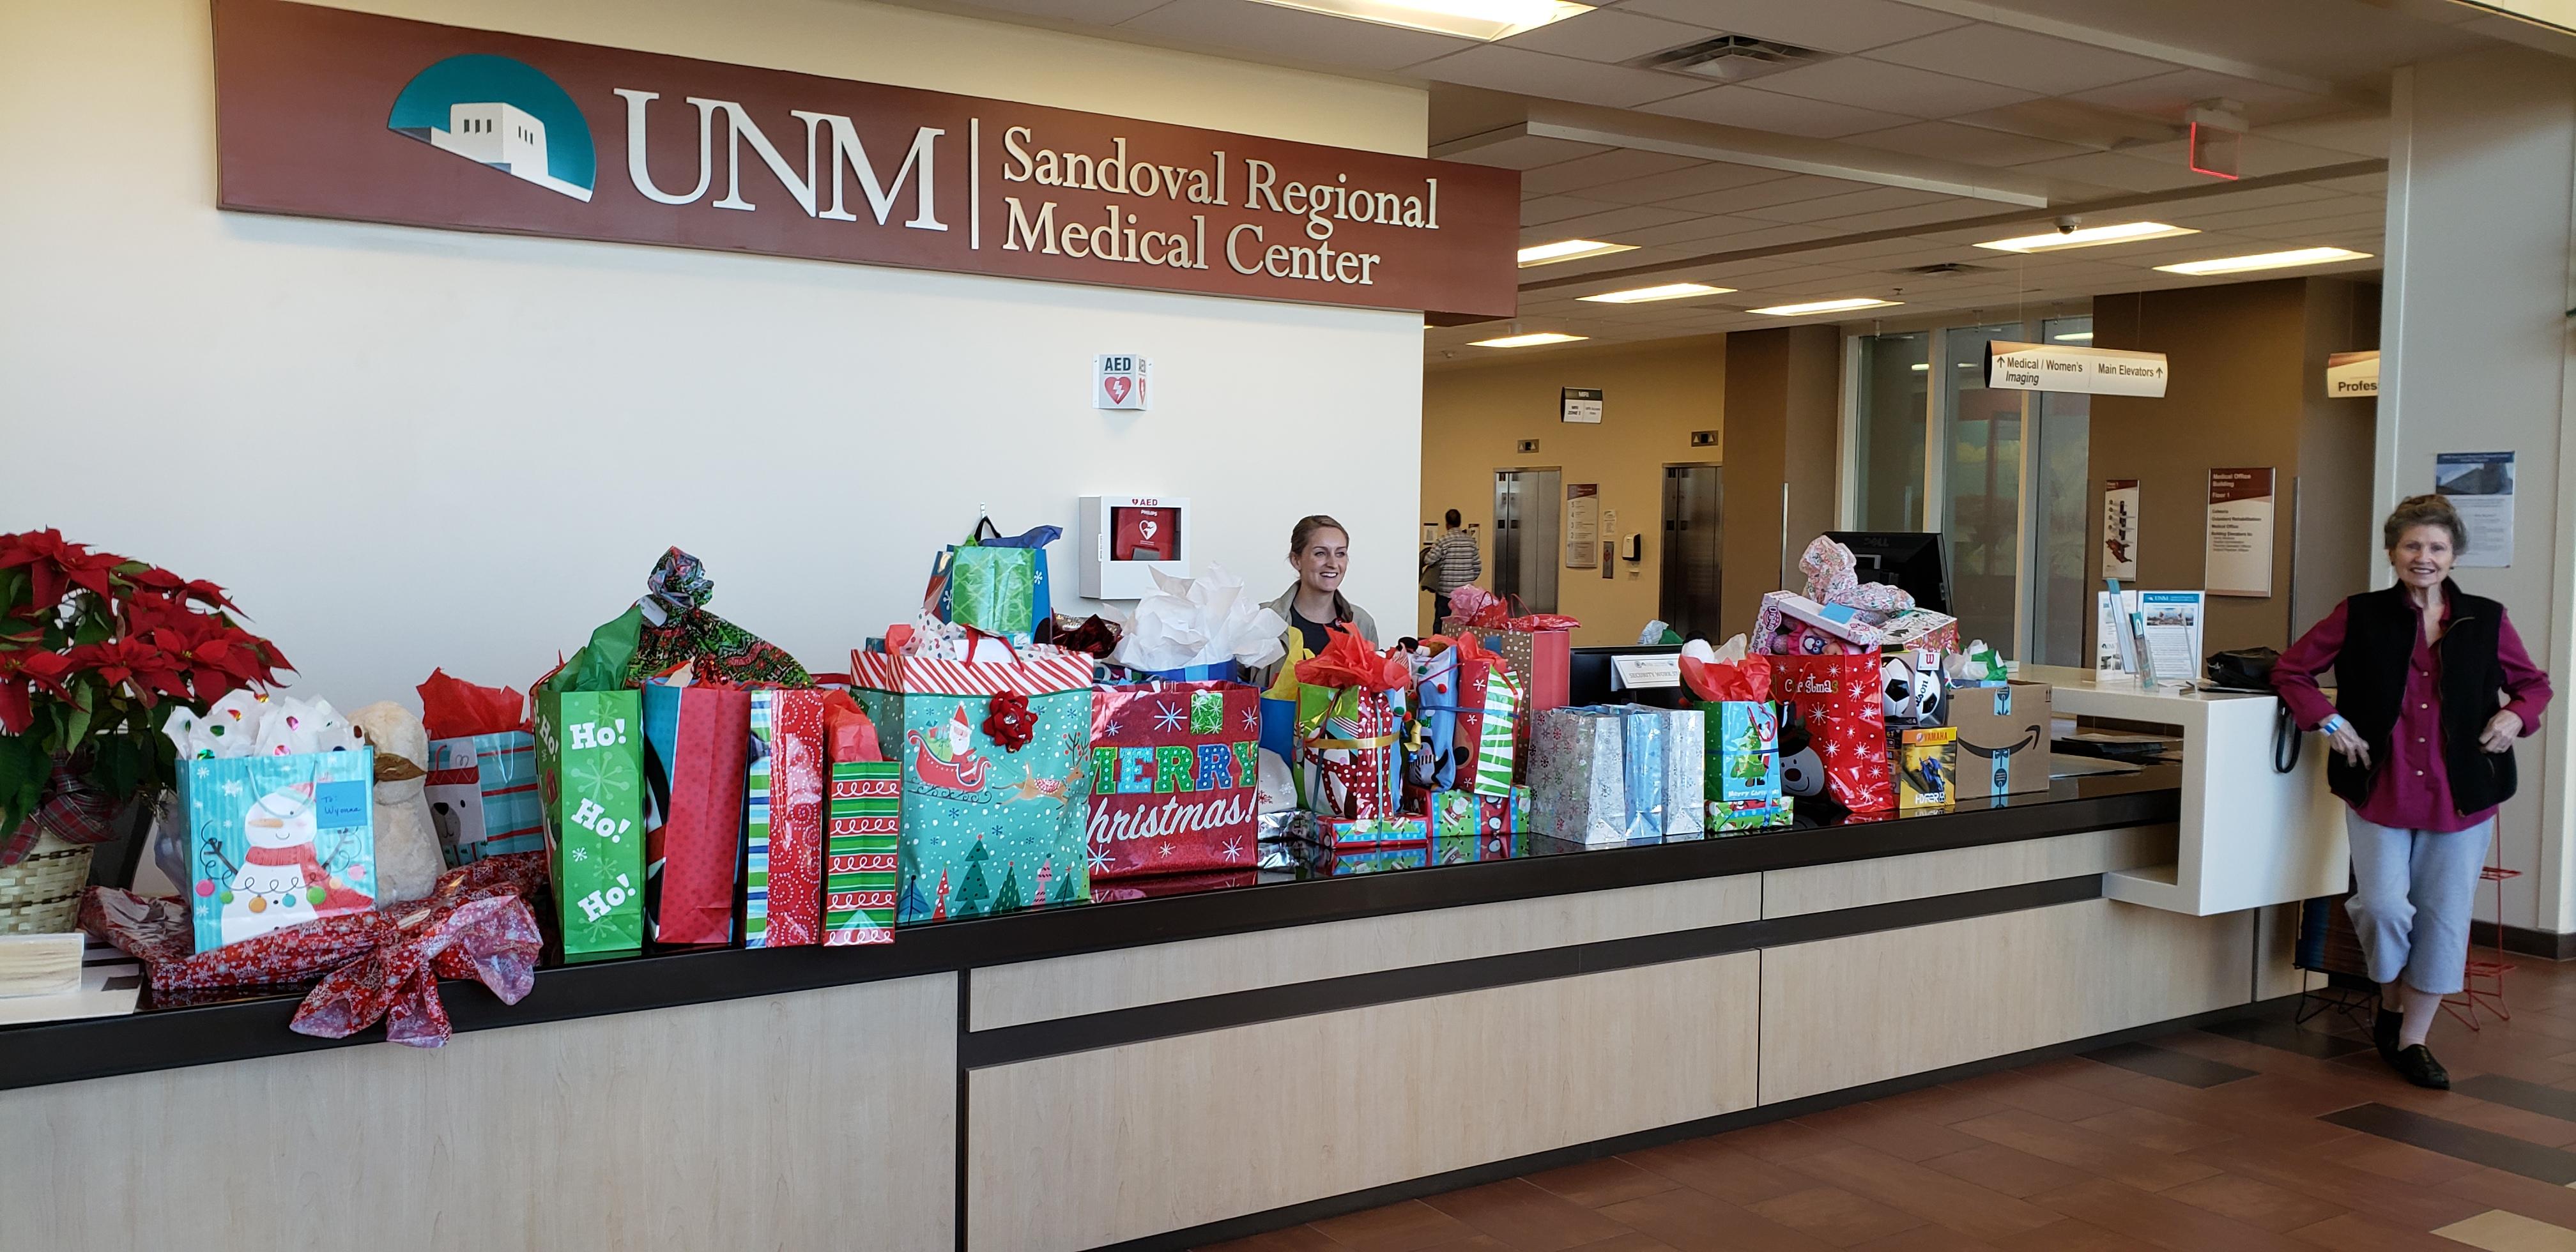 Much Appreciation to UNM Sandoval Regional Medical Center